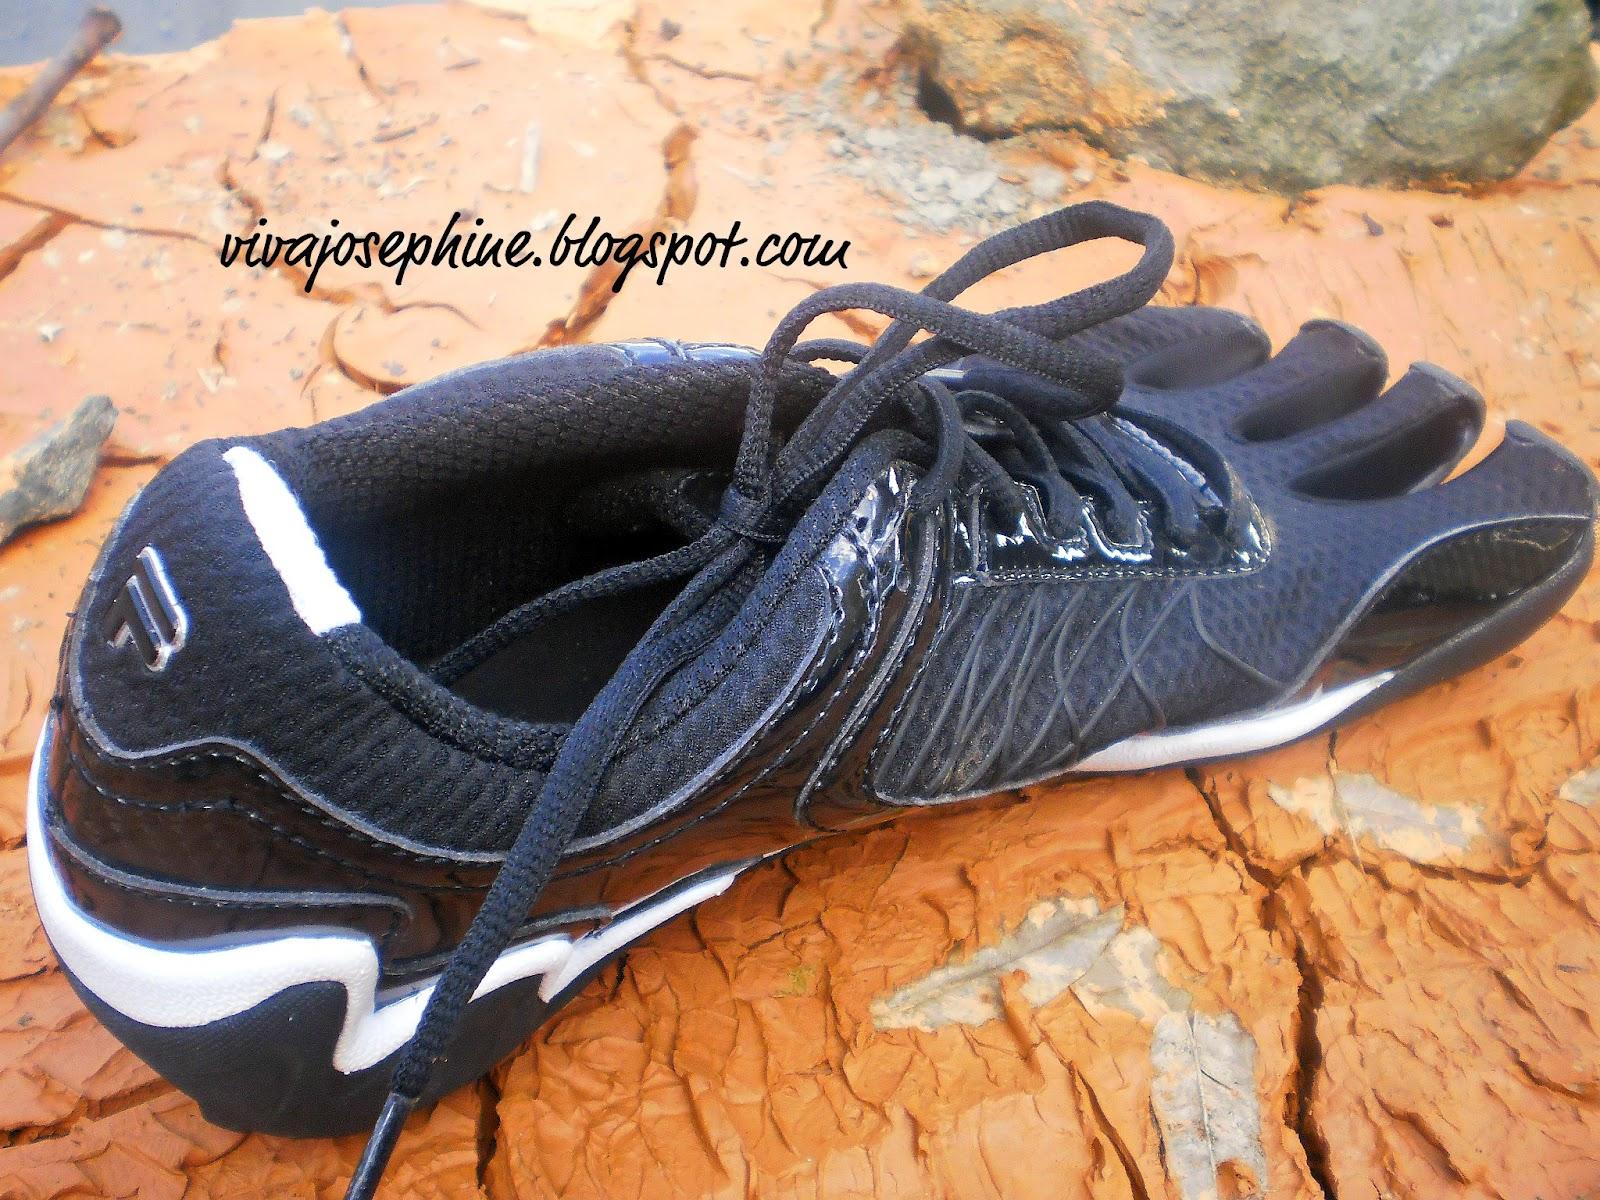 BHFO 5015 D Fila Mens Skele Toes EZ Slide  Black Scuba Running Shoes 10 Medium